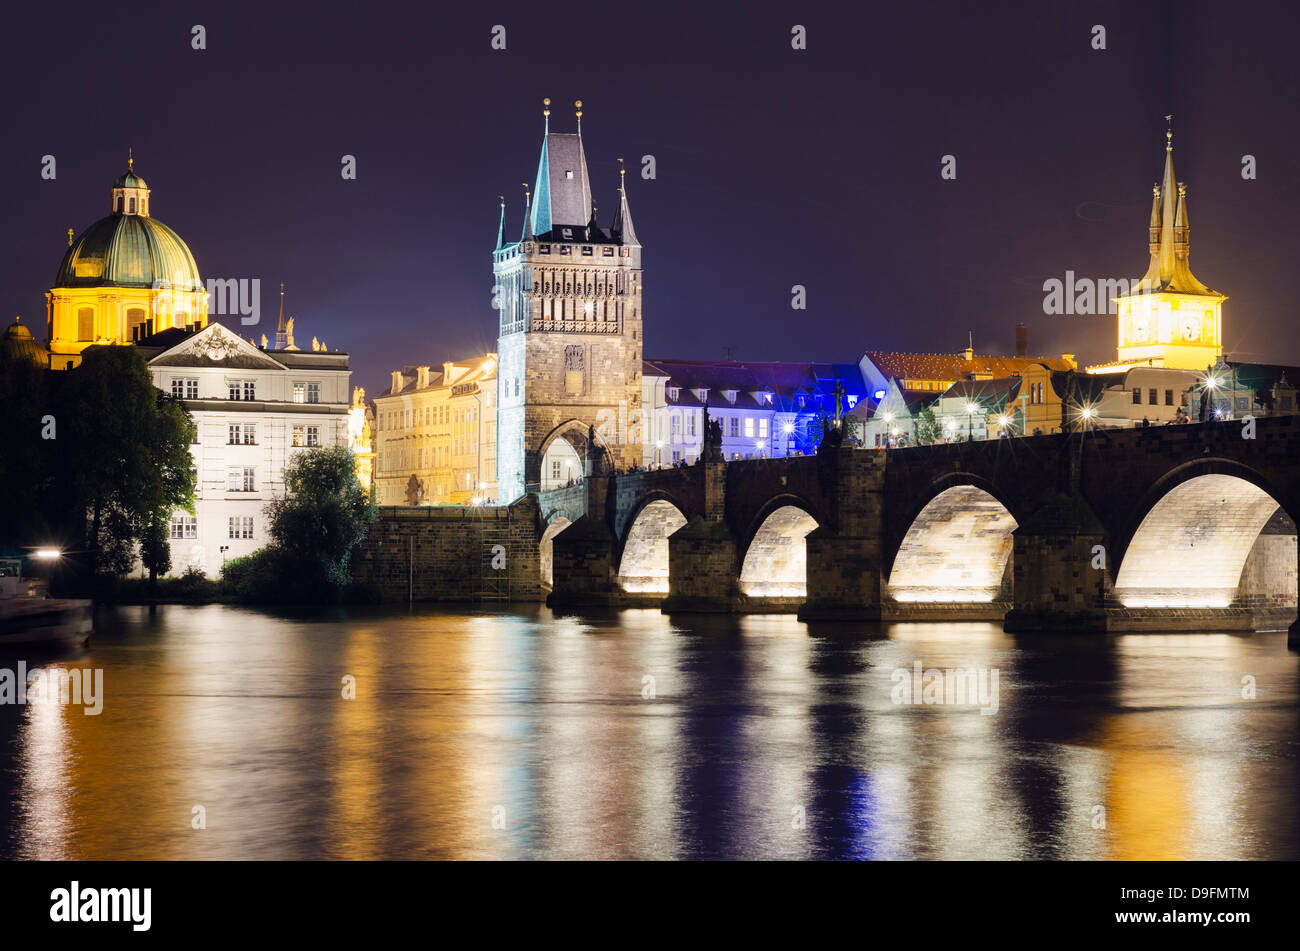 Charles Bridge and Mala Strana Bridge Tower, UNESCO World Heritage Site, Prague, Czech Republic - Stock Image